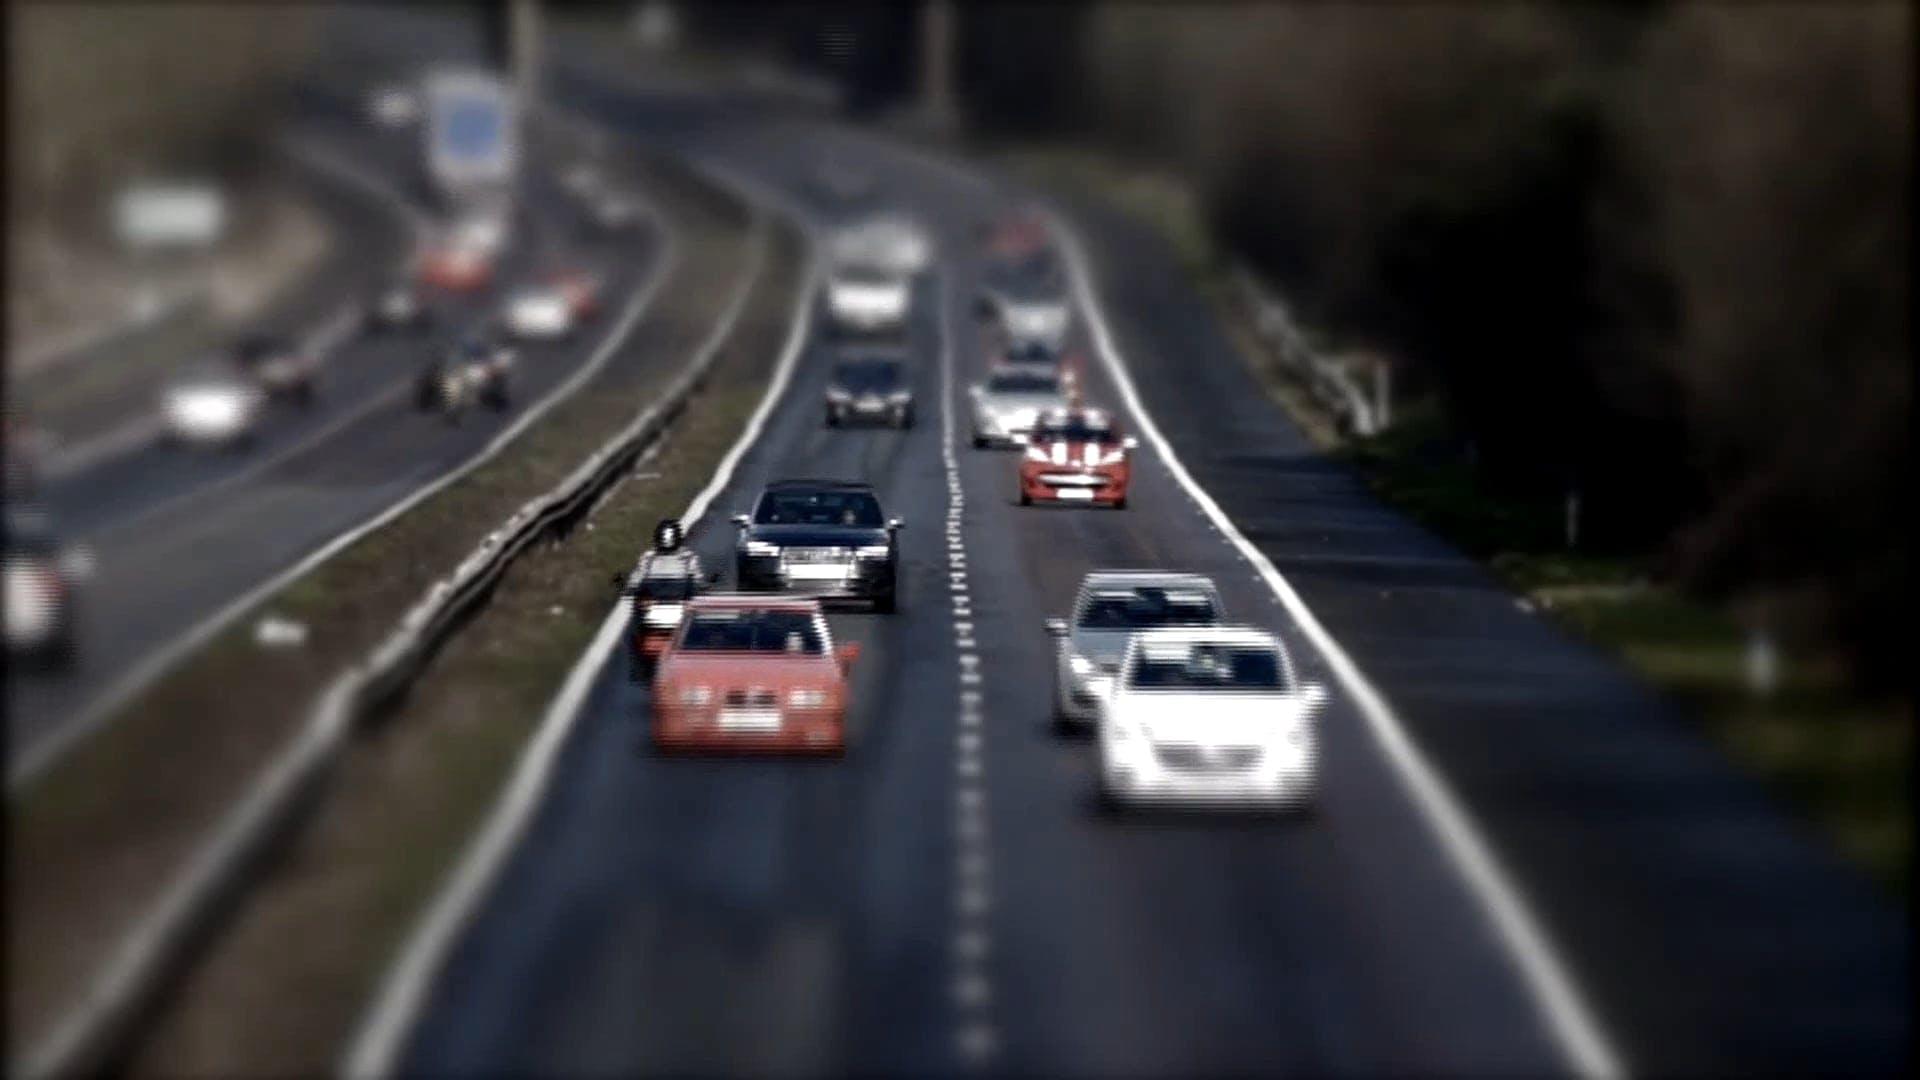 Video Footage Of Traffic